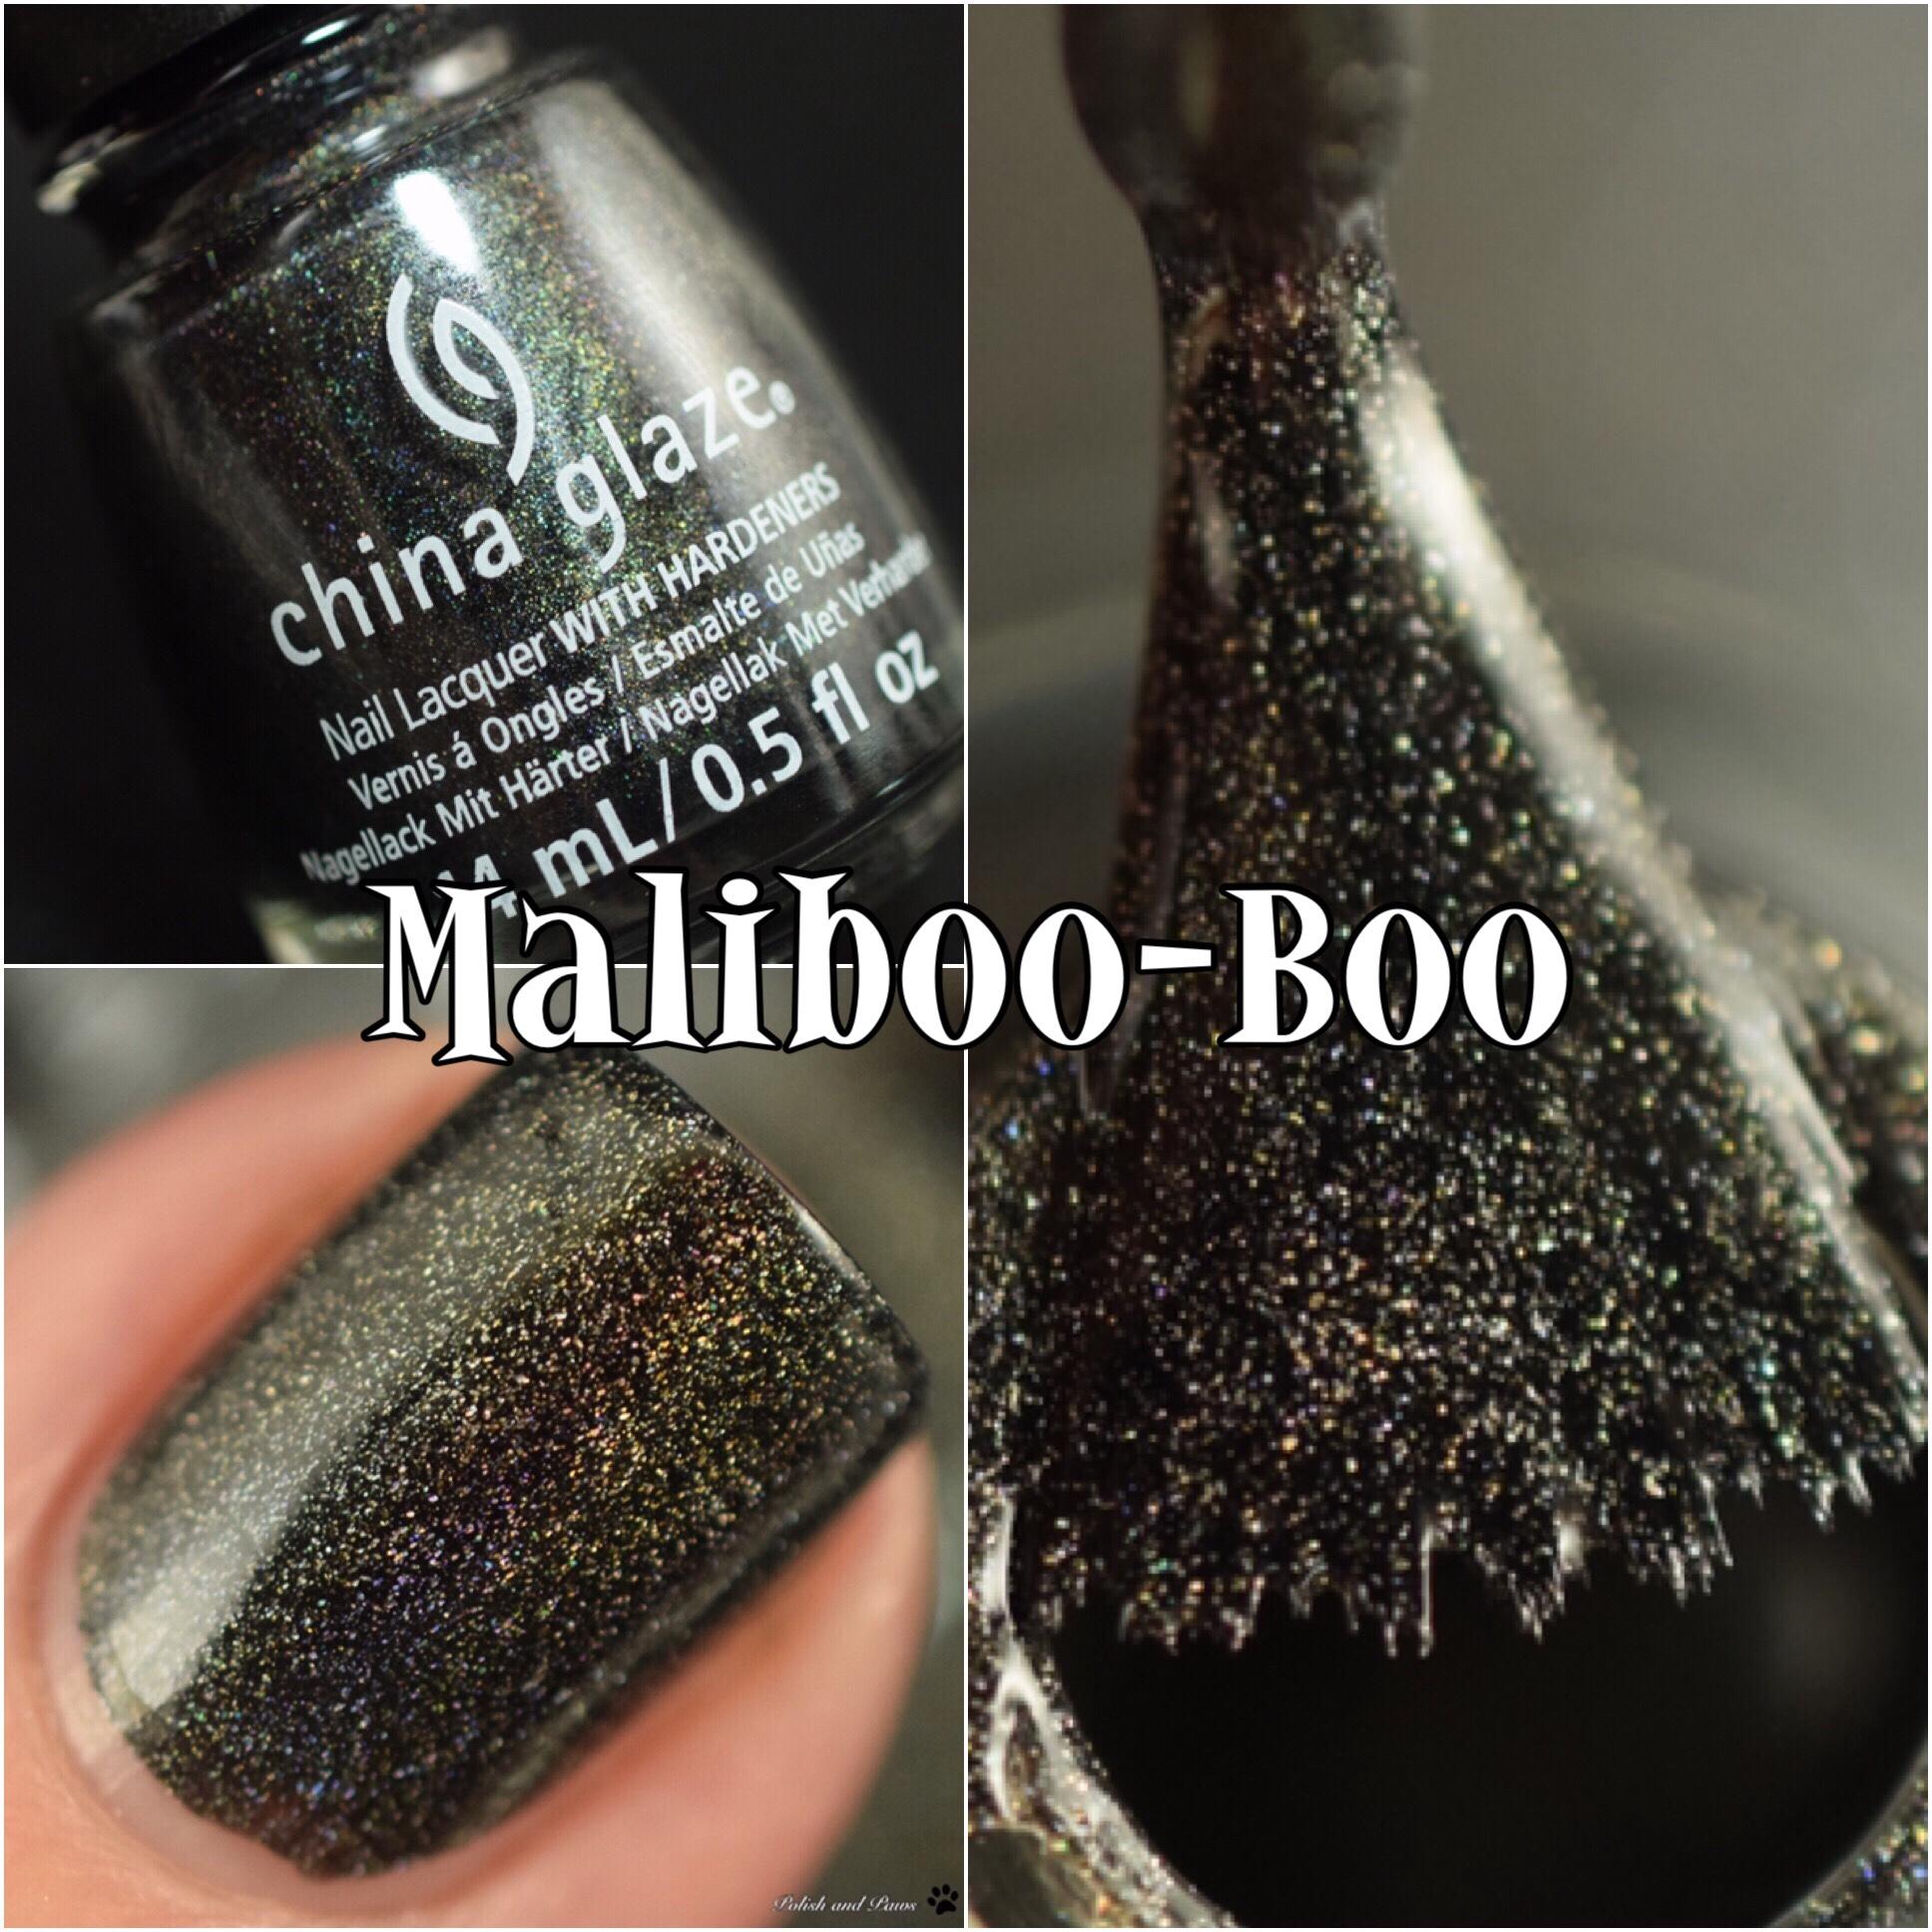 China Glaze Maliboo-Boo